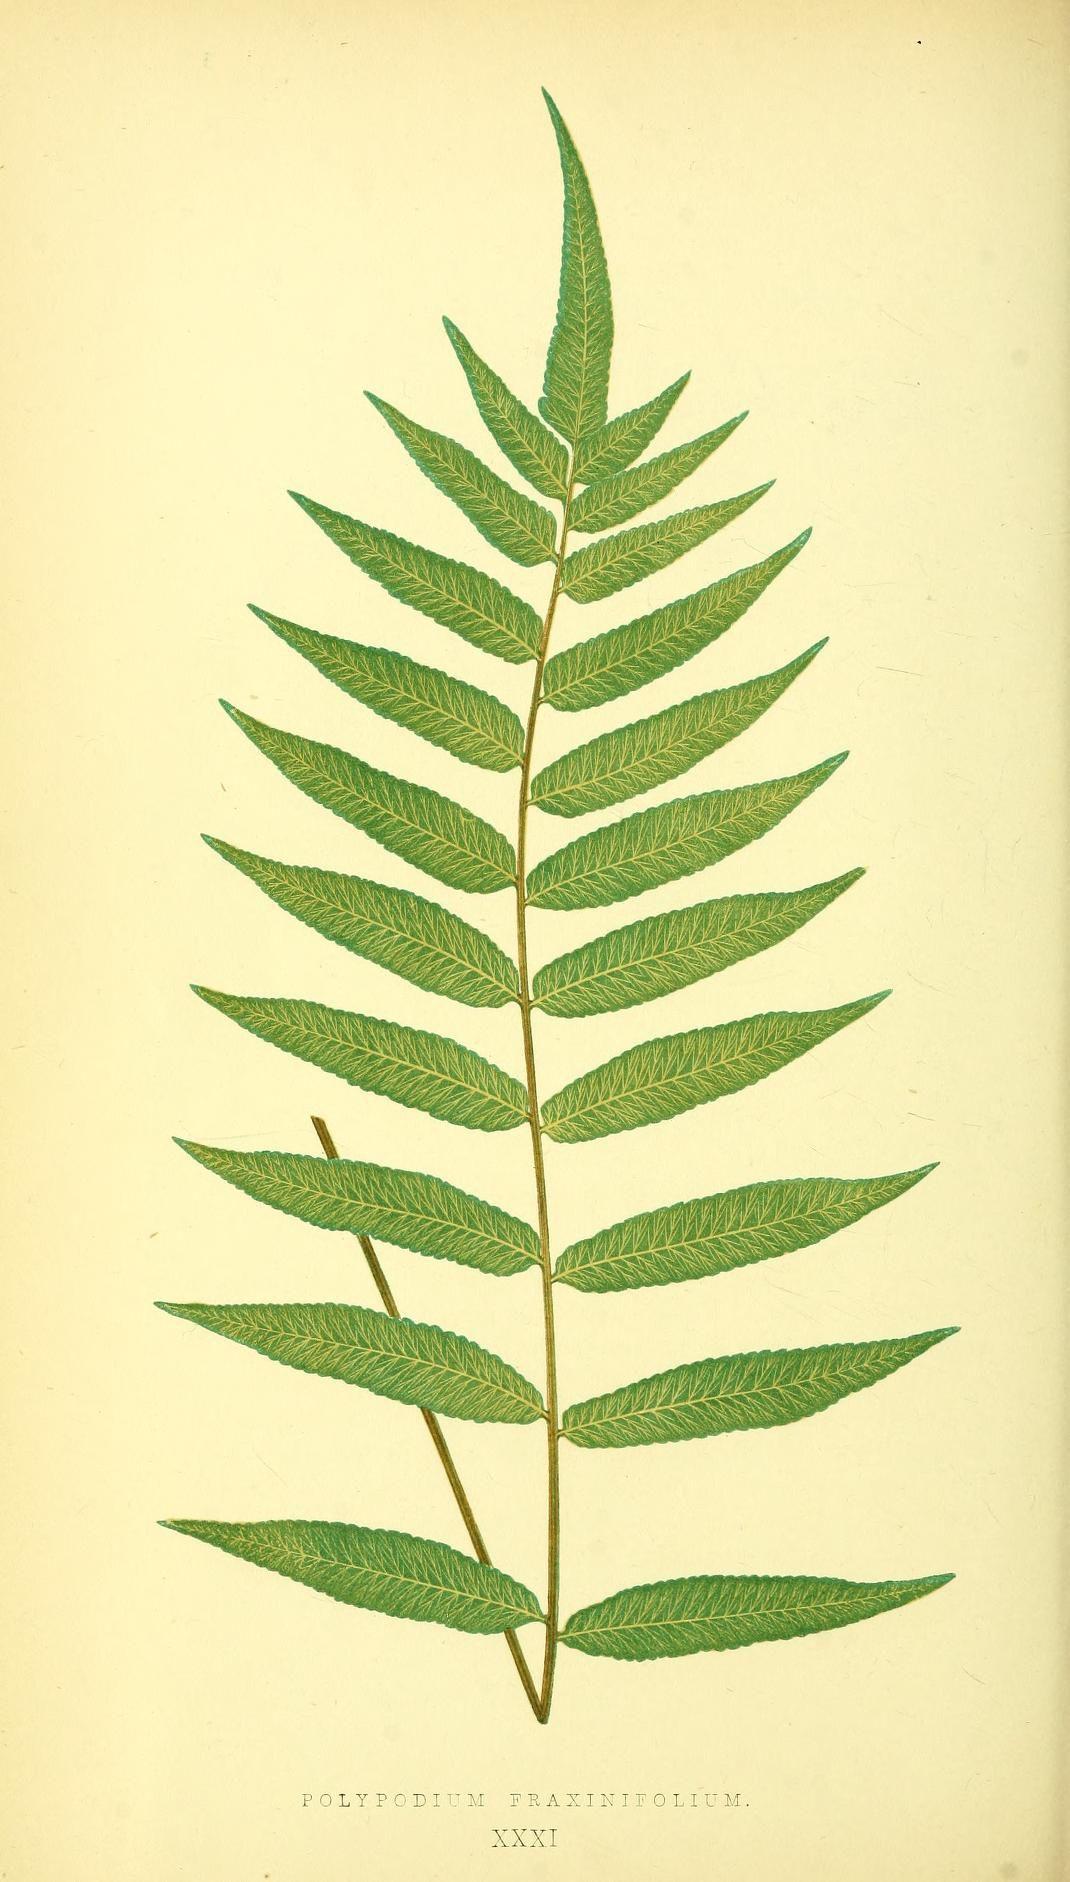 v. 1 - Ferns: British and exotic... - Biodiversity Heritage Library ...